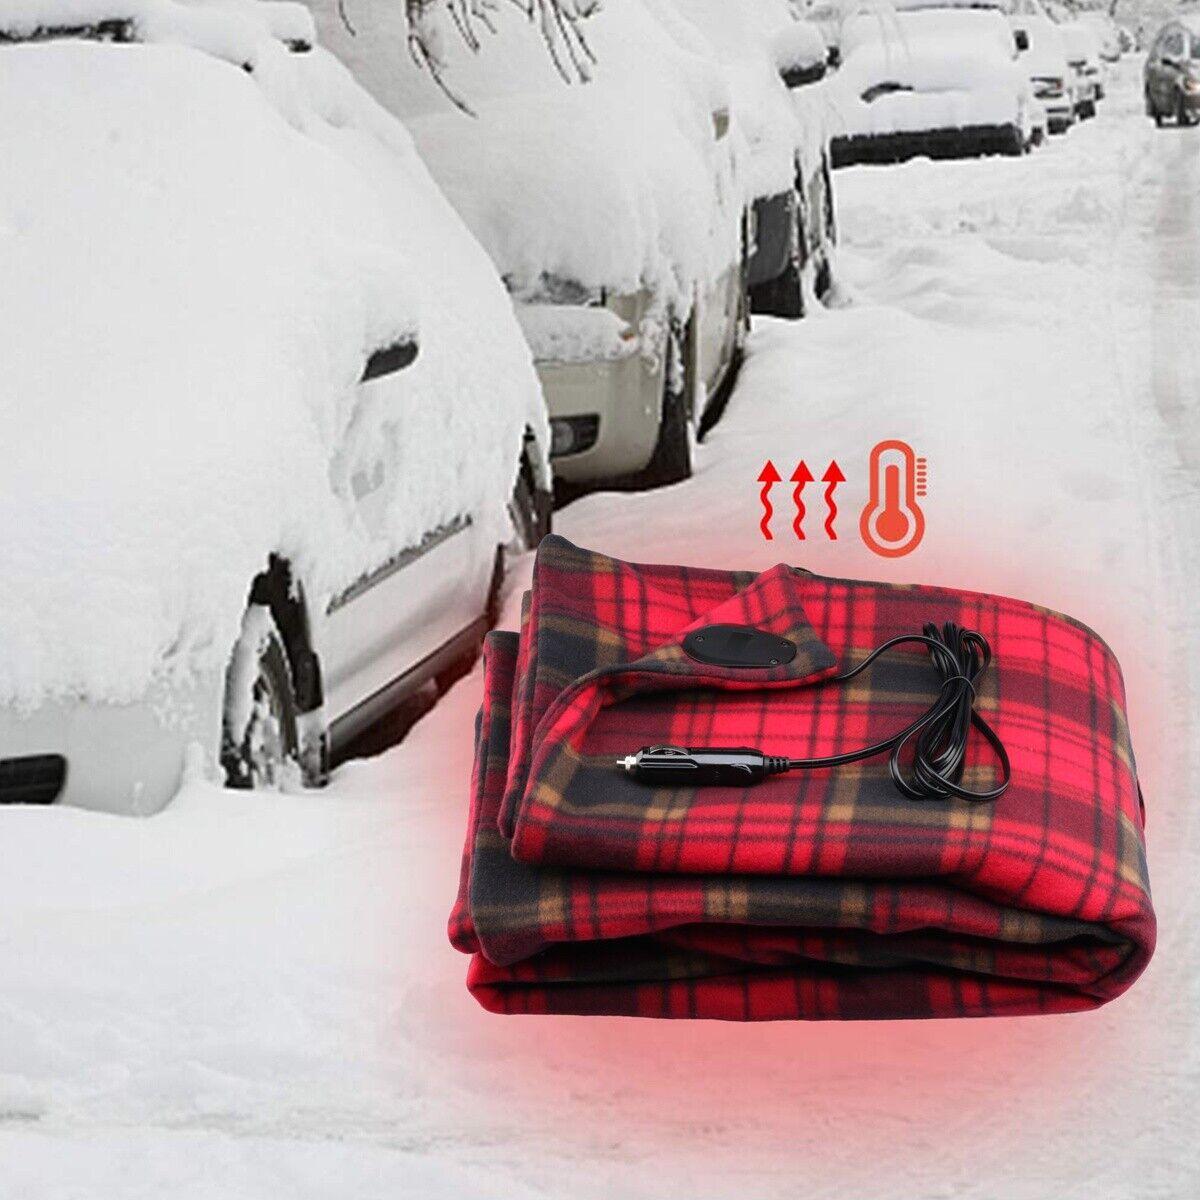 LARGE 12V ELECTRIC HEATED CAR VAN TRUCK POLAR FLEECE COZY WA